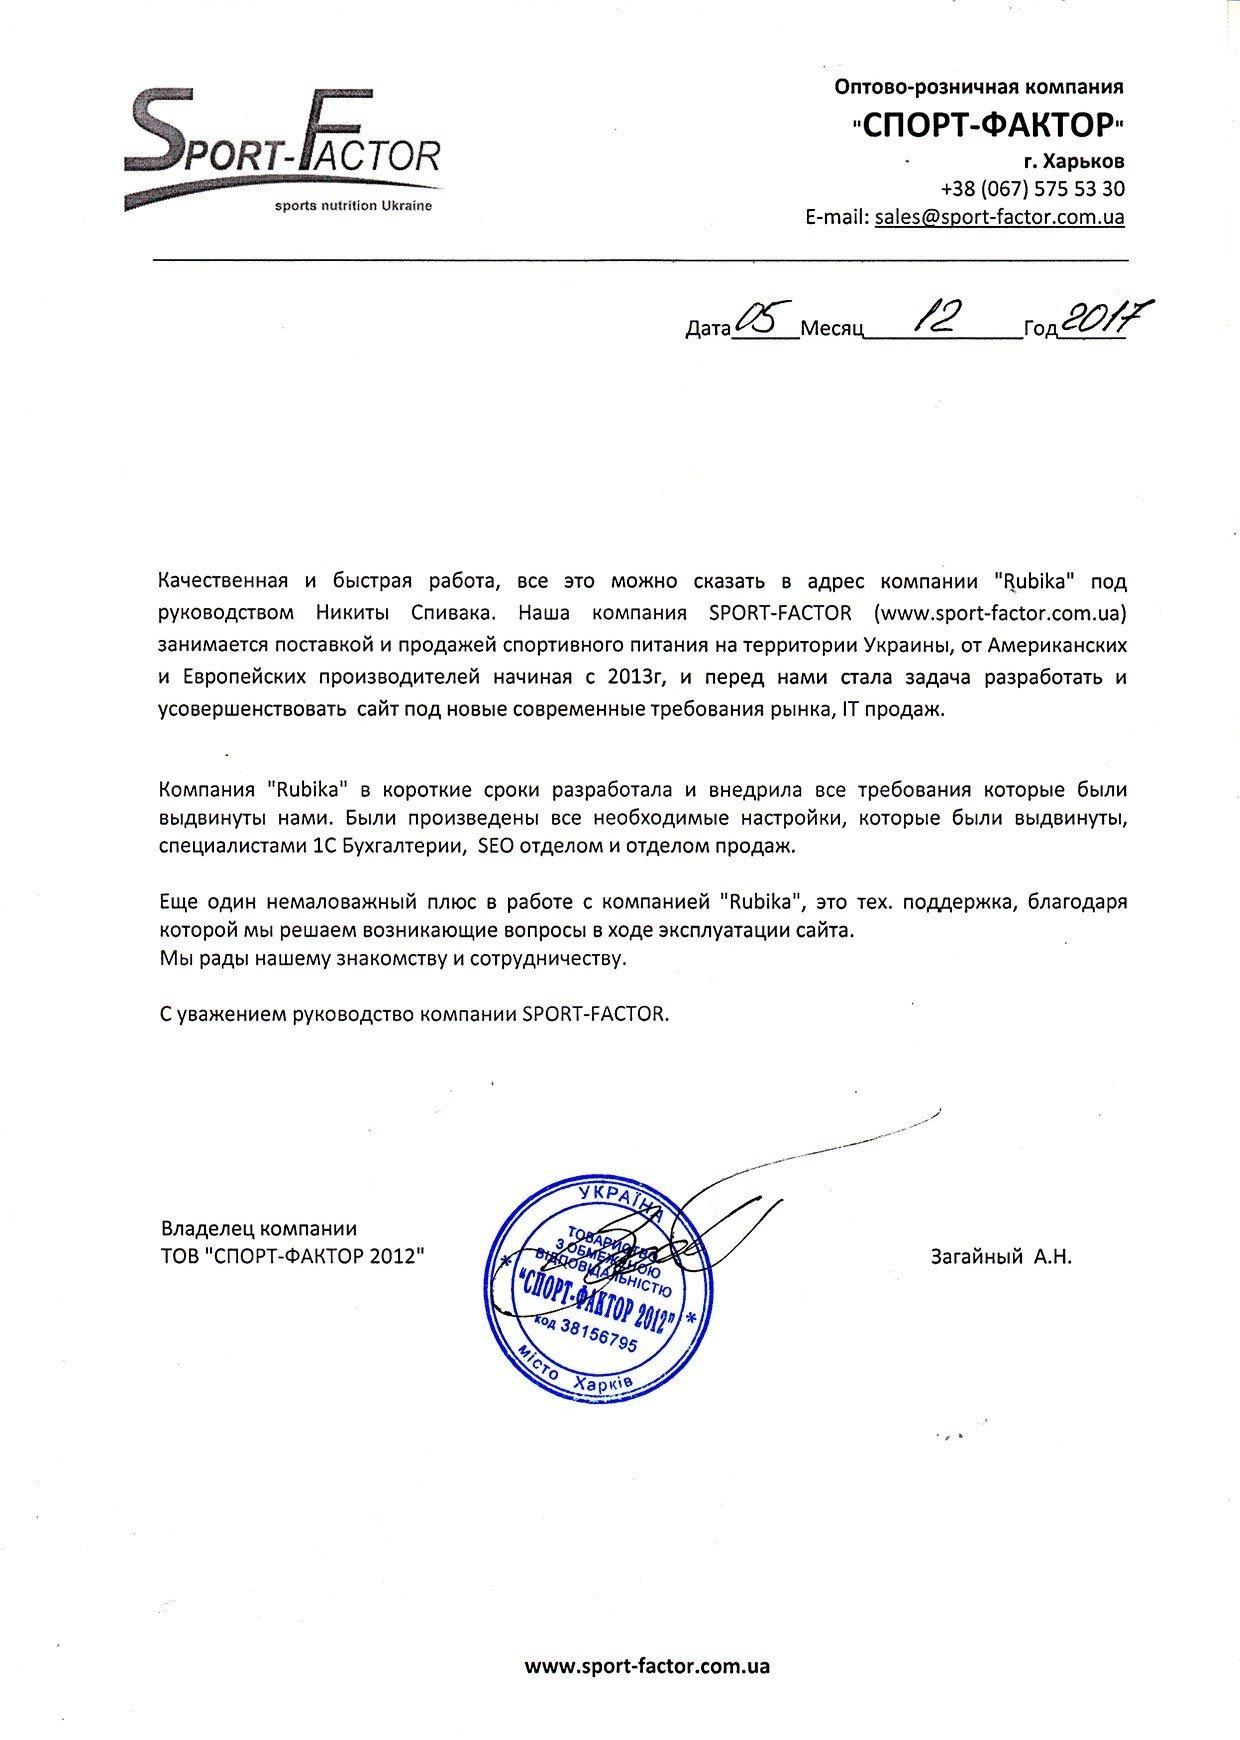 Відгук sport-factor.com.ua